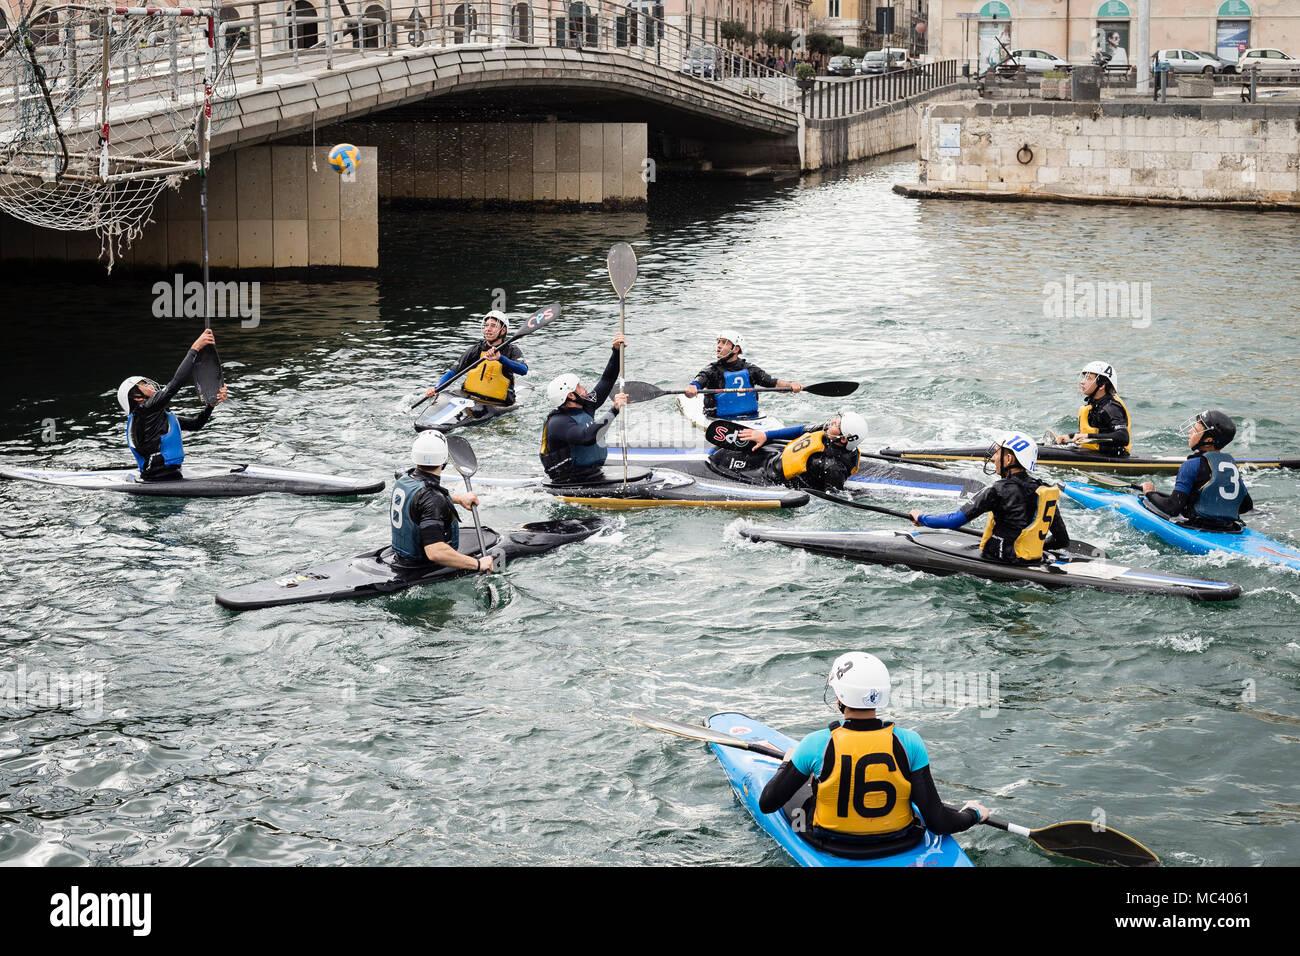 Canoe polo match in Ortigia, Siracusa, Sicily. - Stock Image